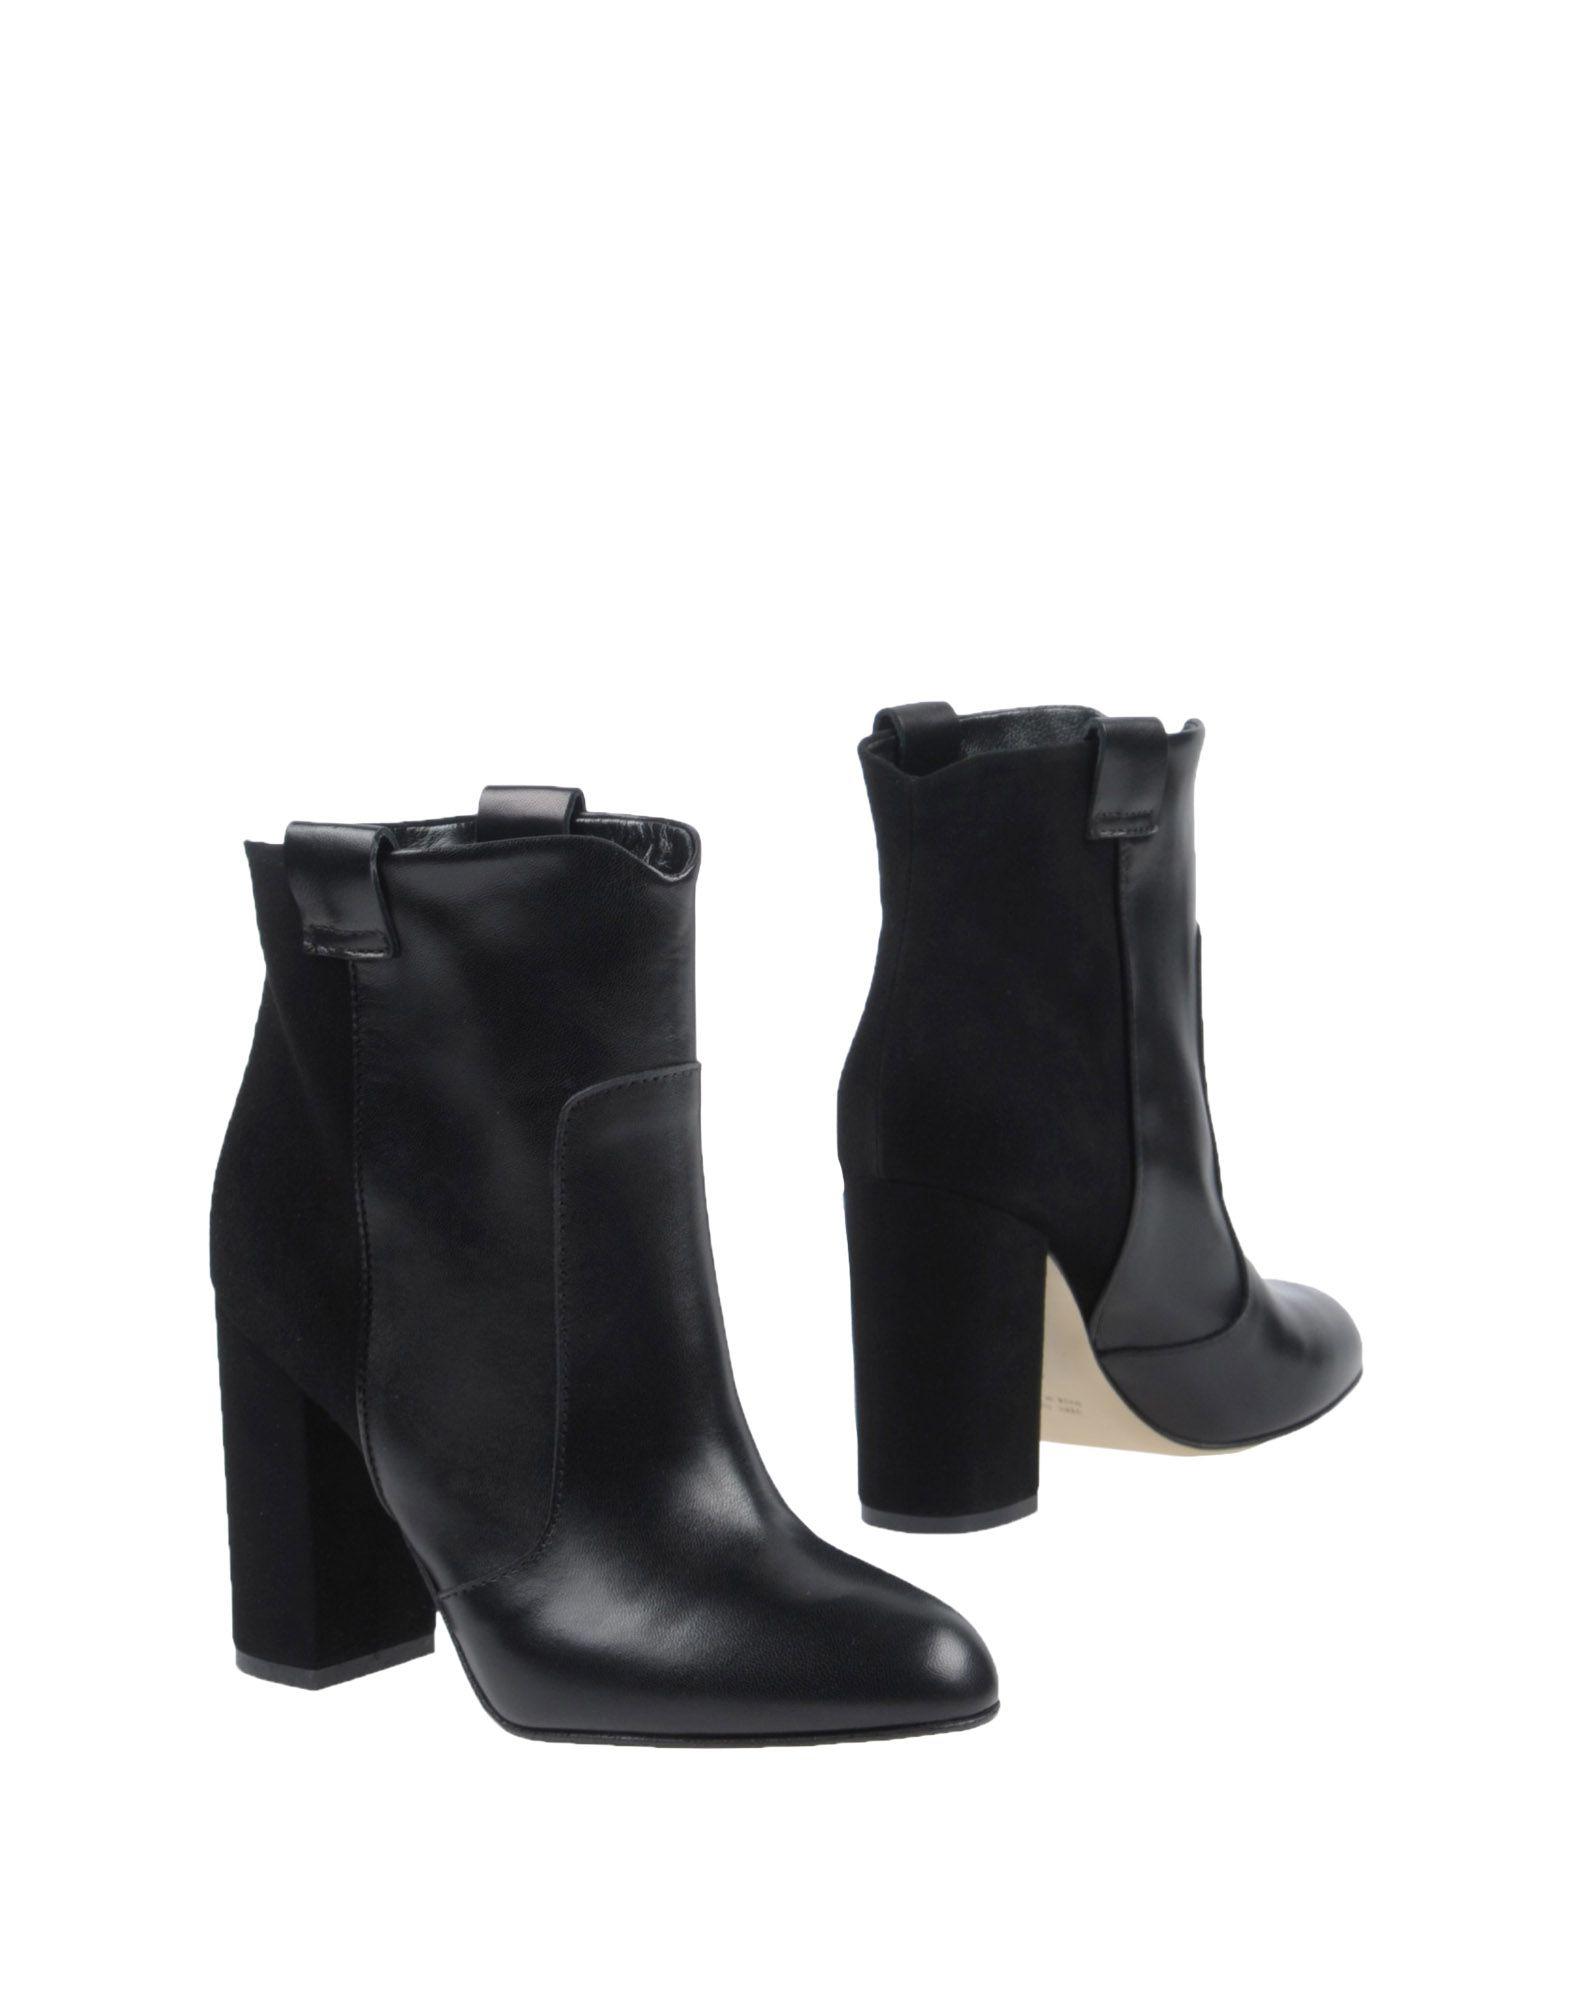 ATOS LOMBARDINI Полусапоги и высокие ботинки atos lombardini полусапоги и высокие ботинки